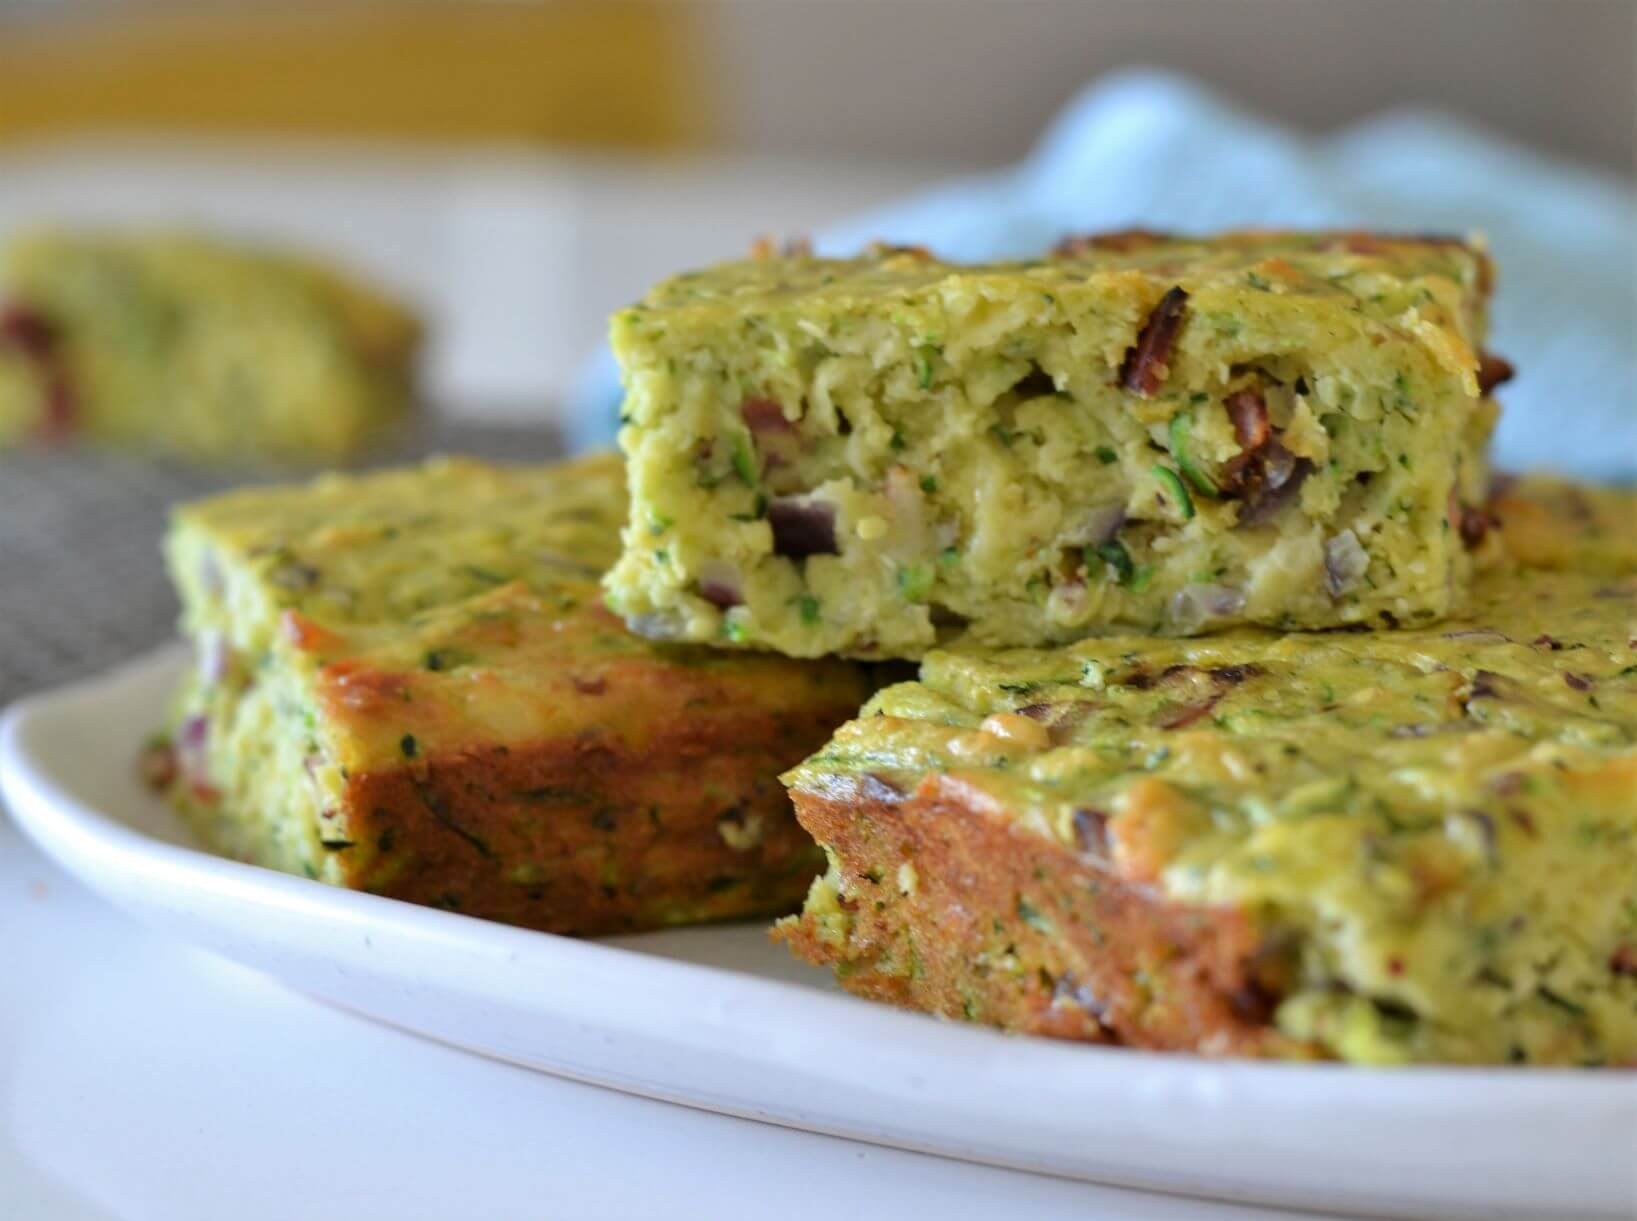 zucchini-slice-on-plate